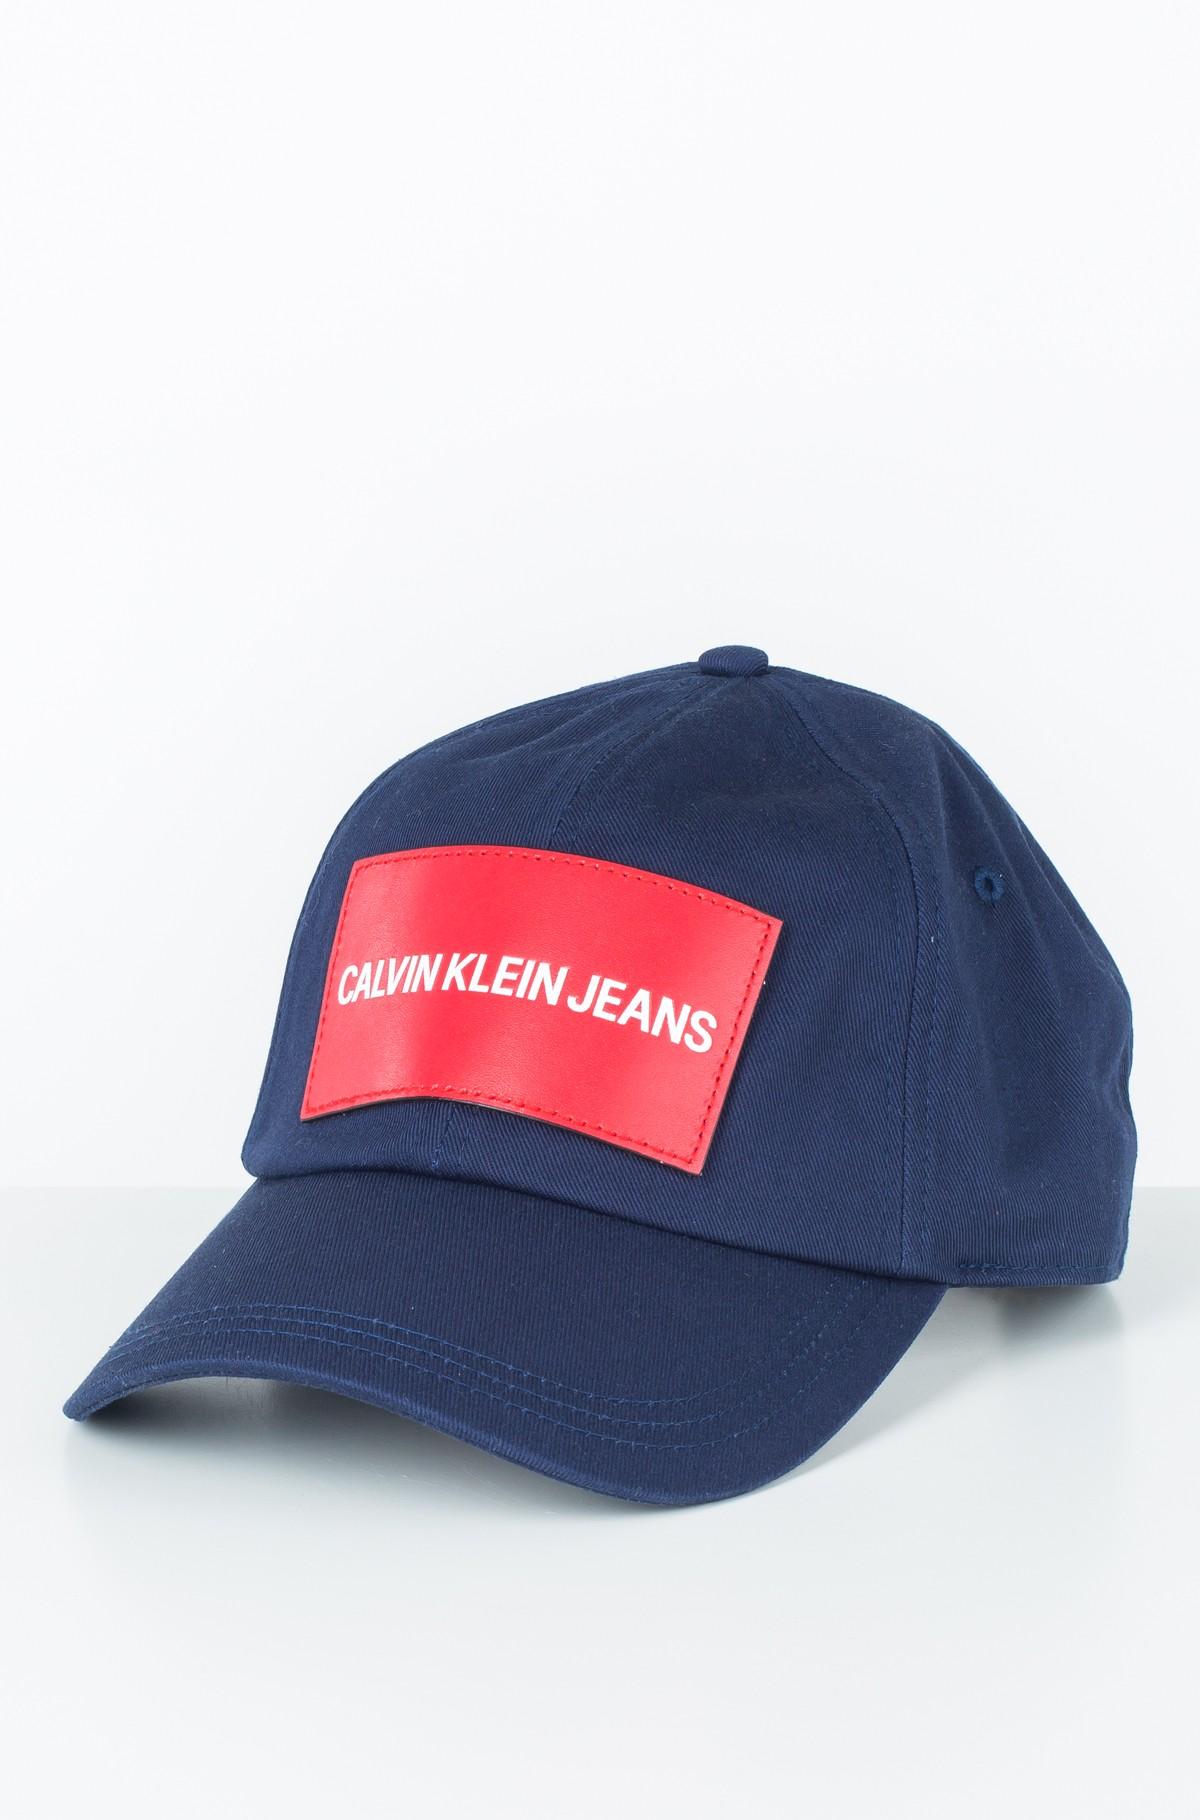 Cepure ar nagu J CALVIN KLEIN JEANS CAP M-full-1